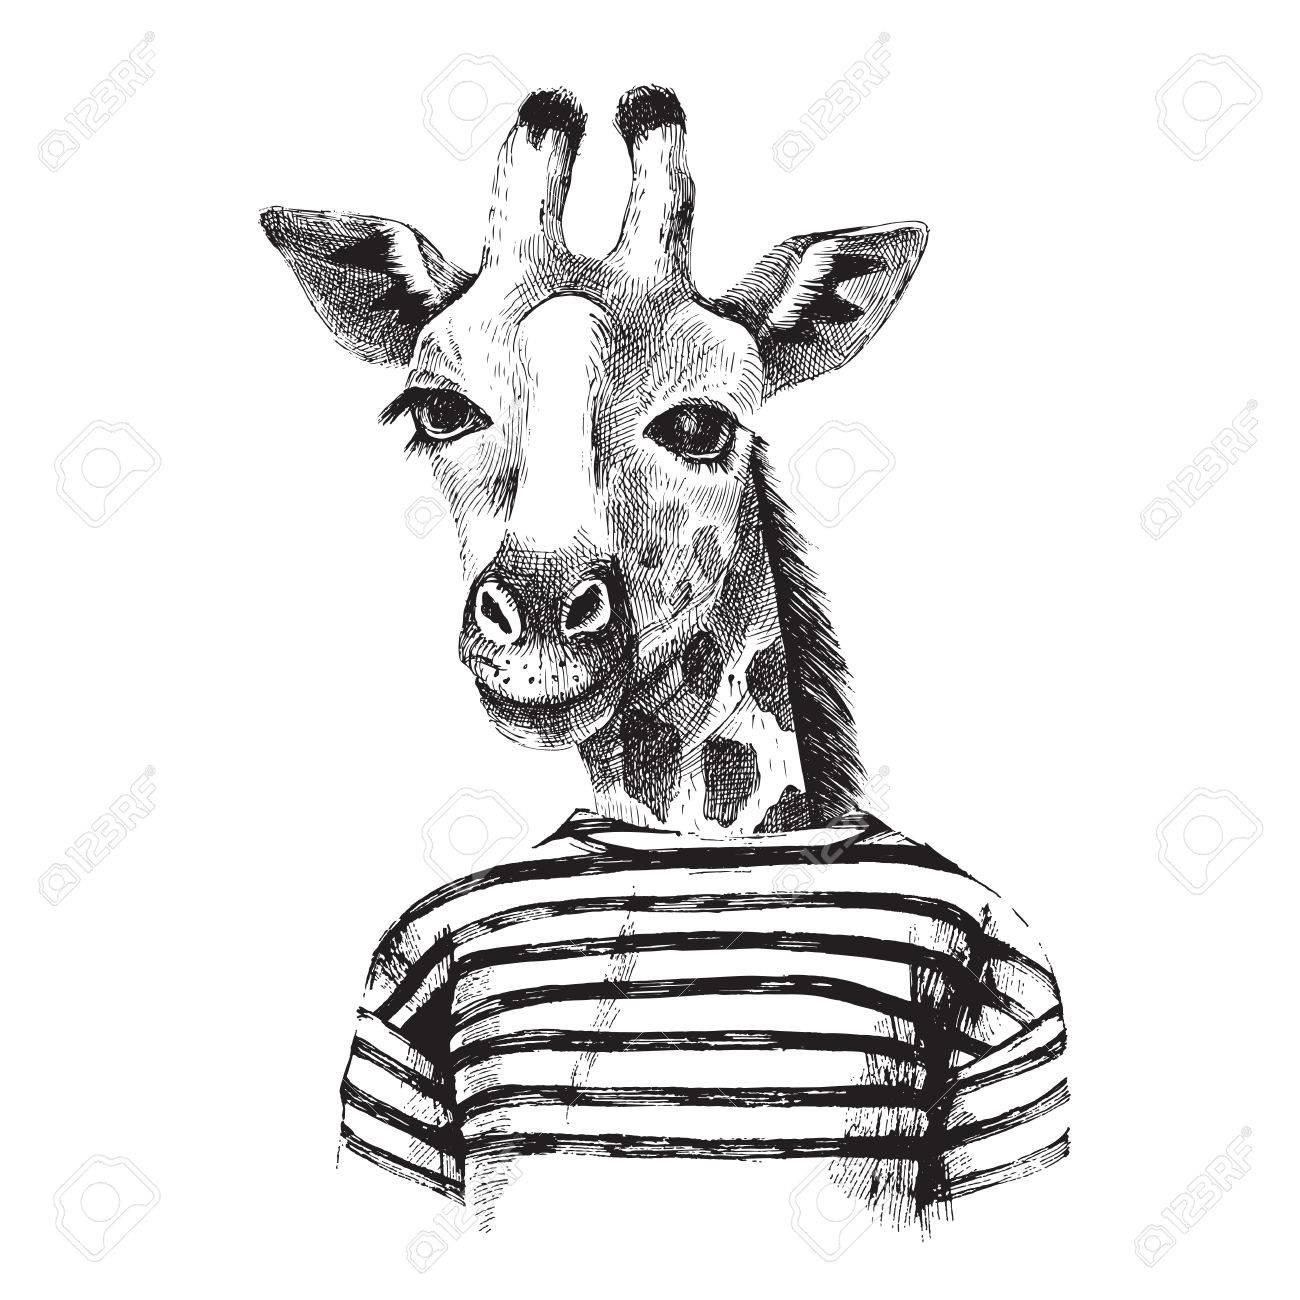 Hand drawn Illustration of dressed up giraffe hipster - 52068958